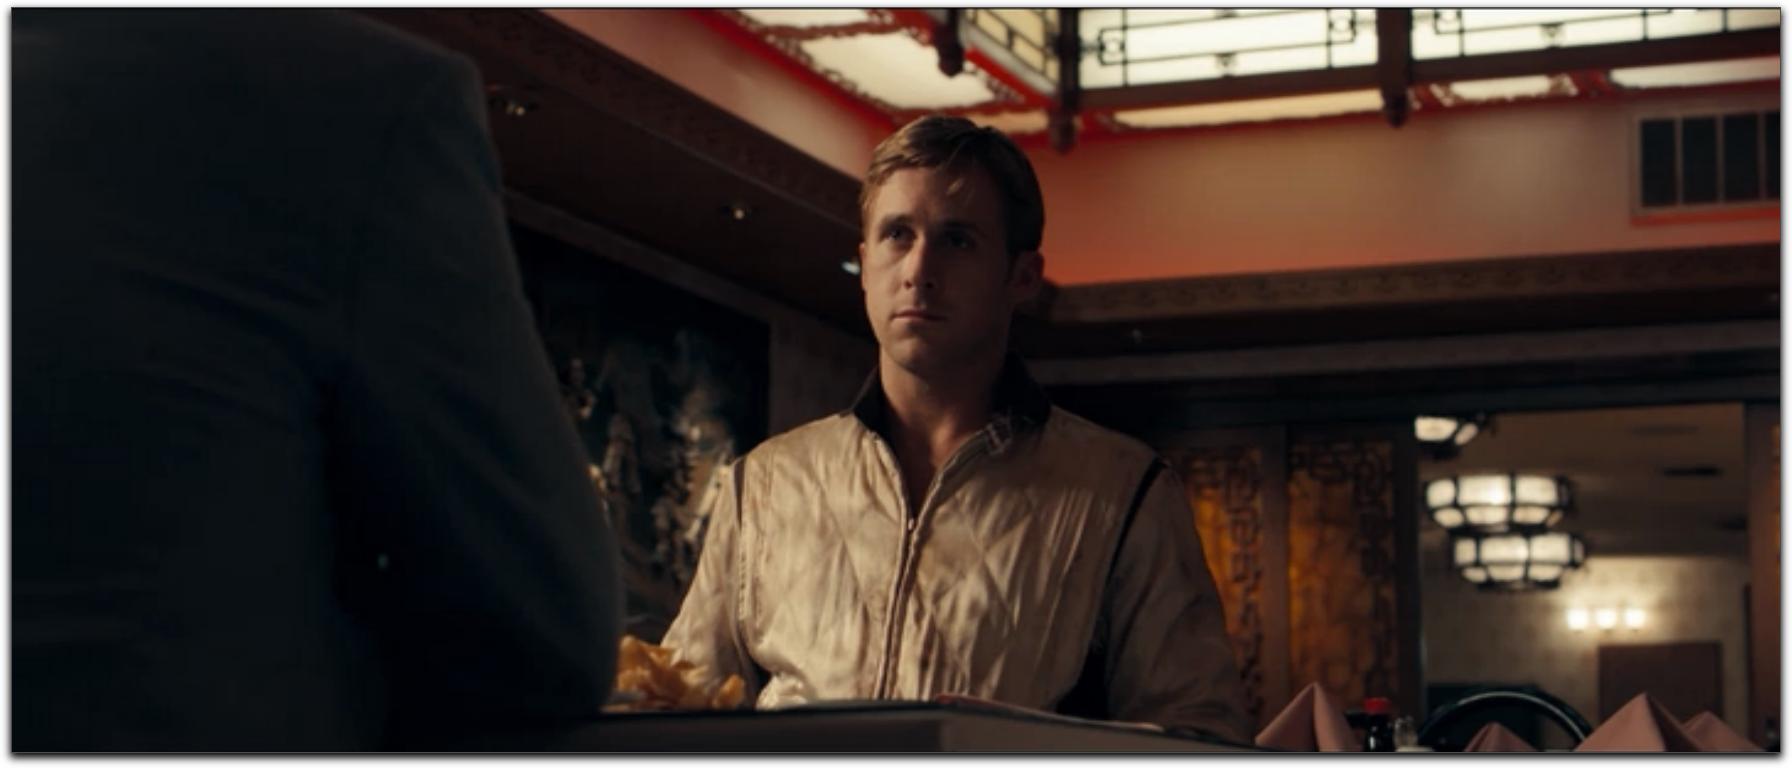 Driving gloves like ryan gosling - Ryan Gosling Drive Chinese Restaurant